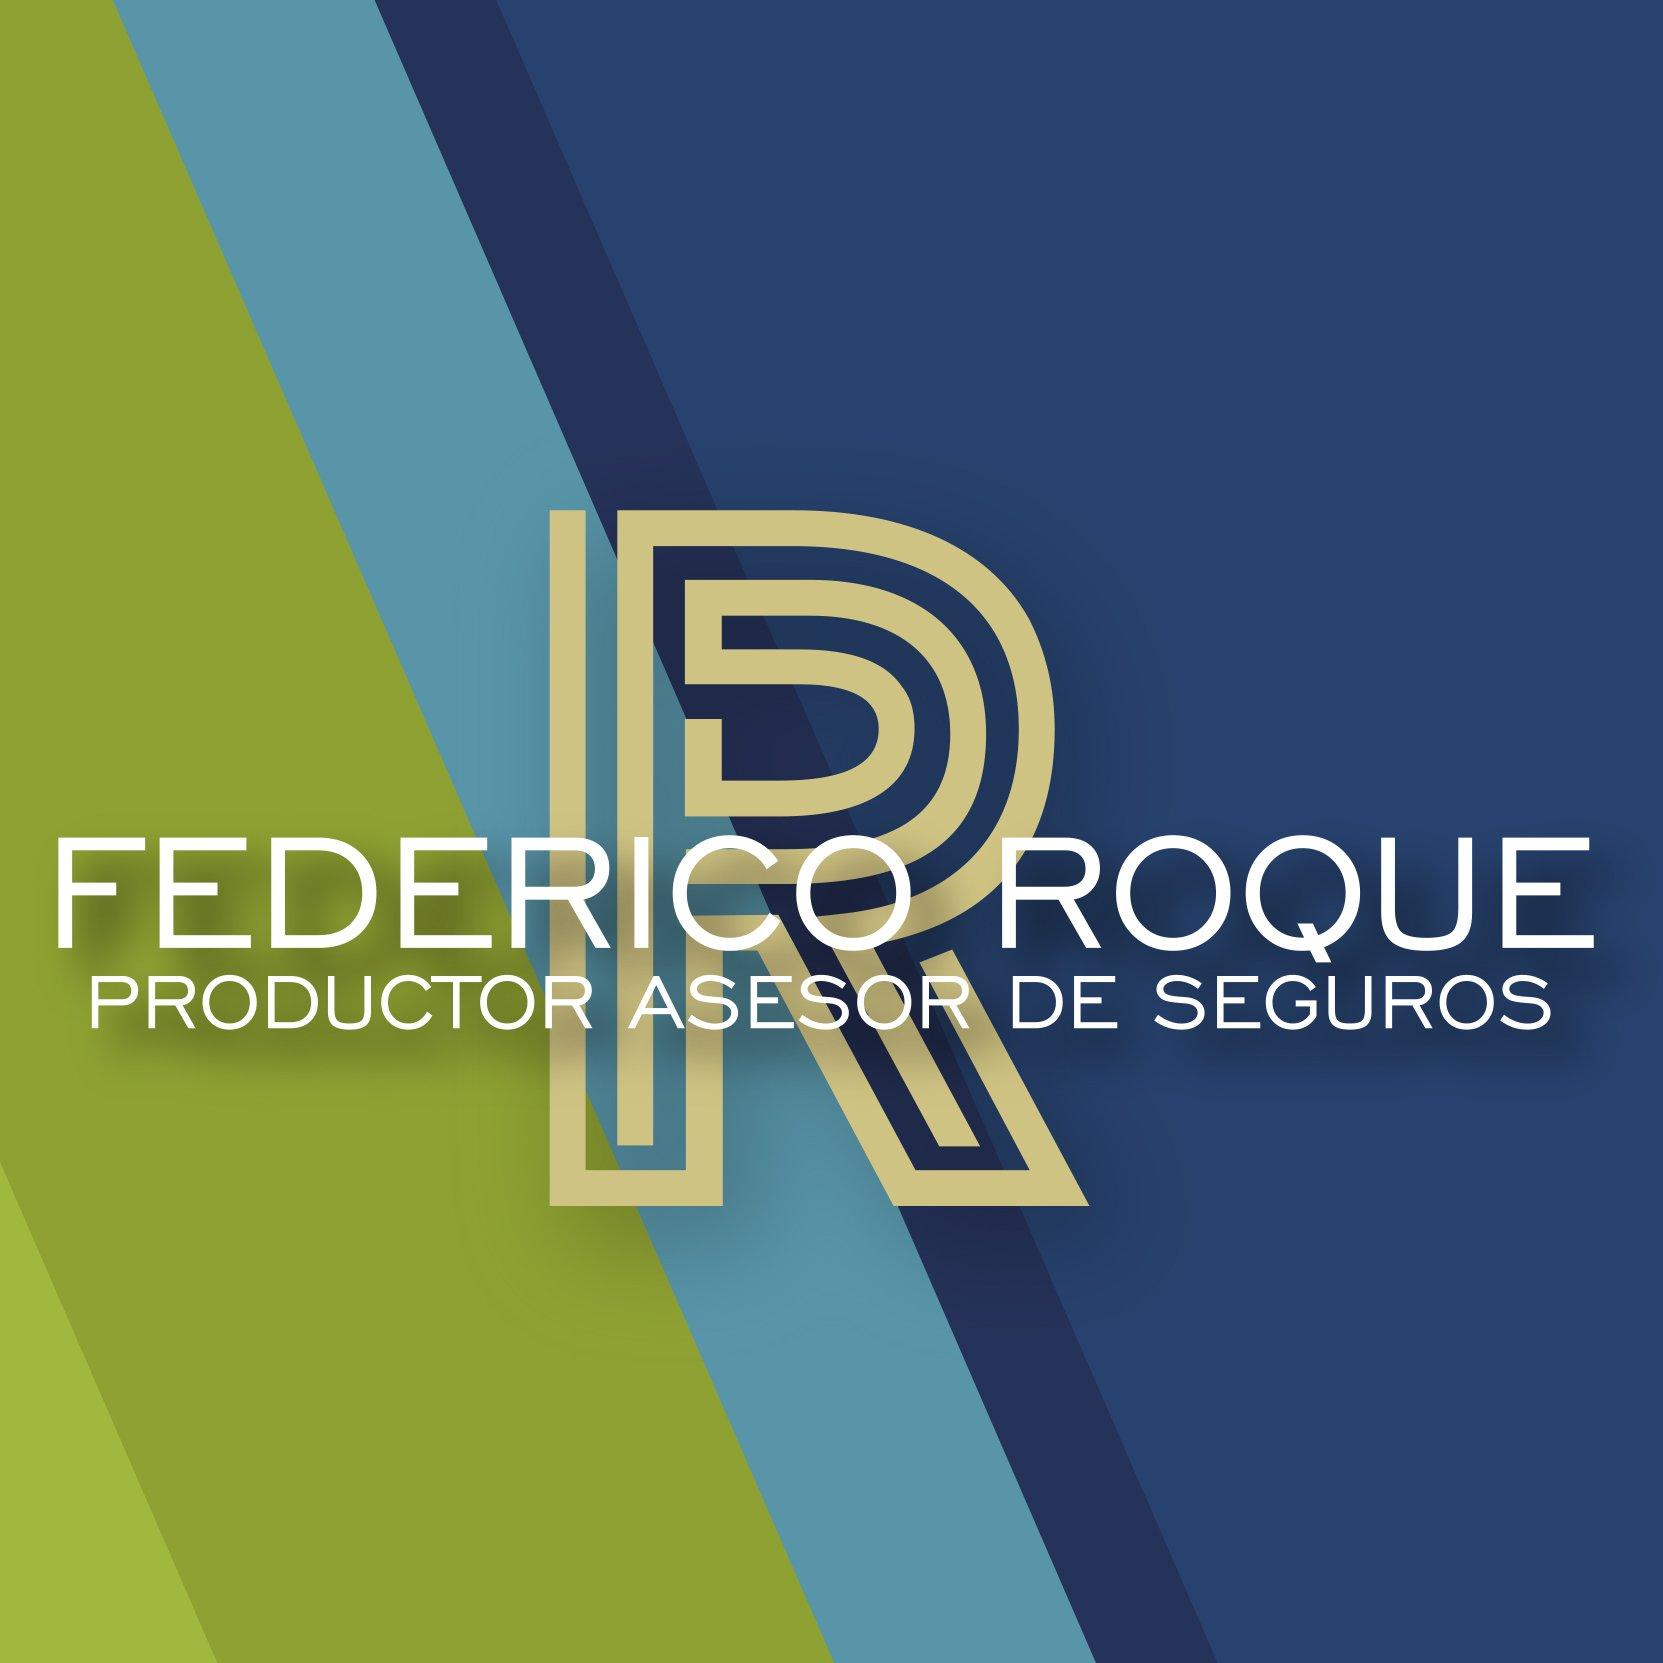 Productor Asesor de Seguros Federico Roque